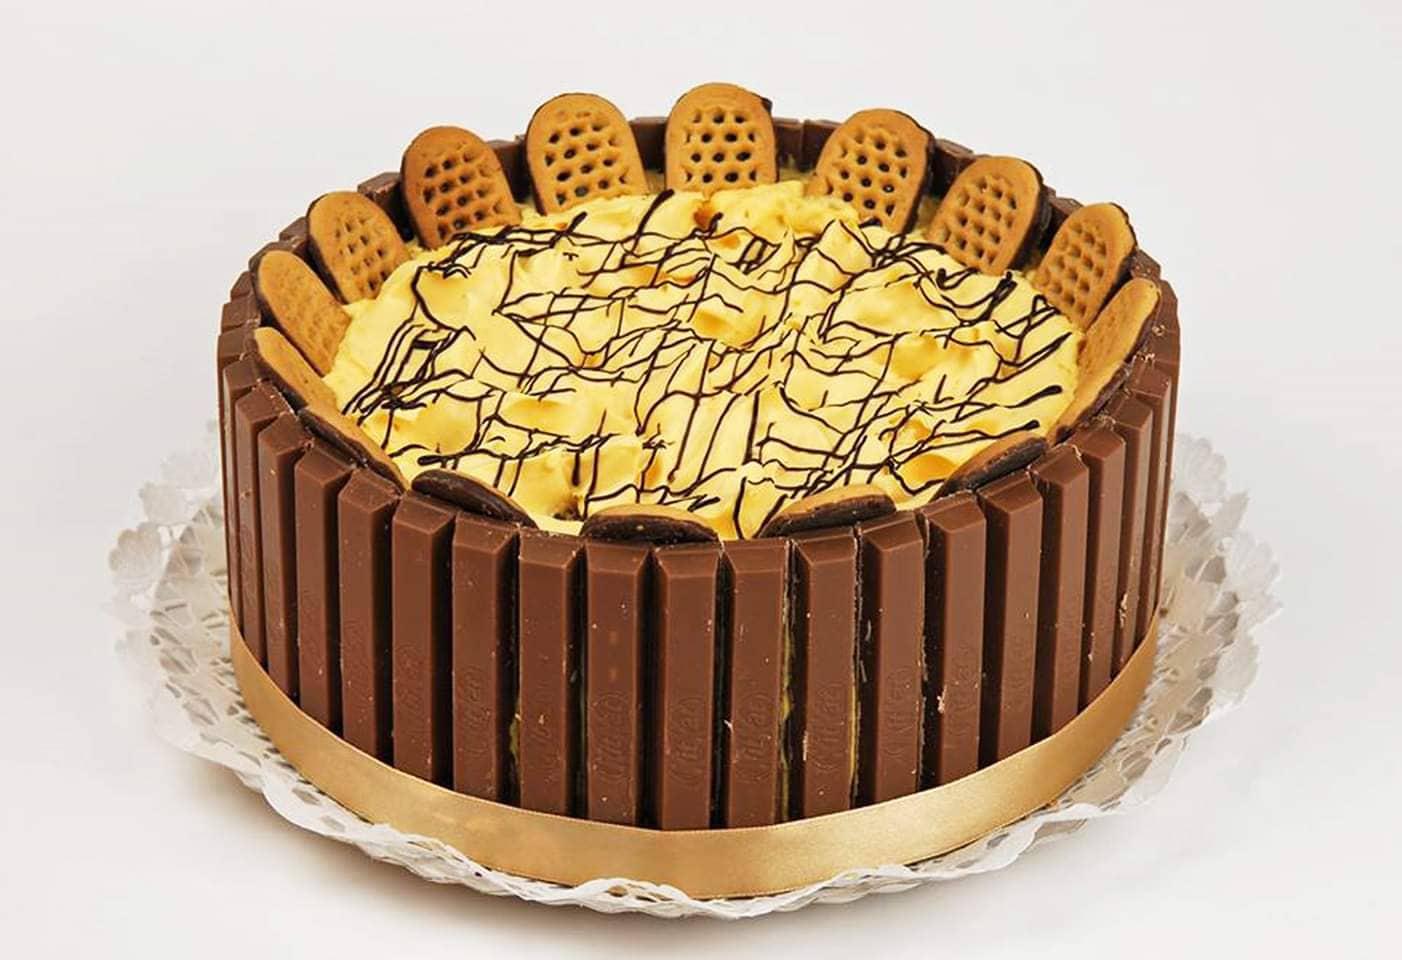 Kit-Kat torta